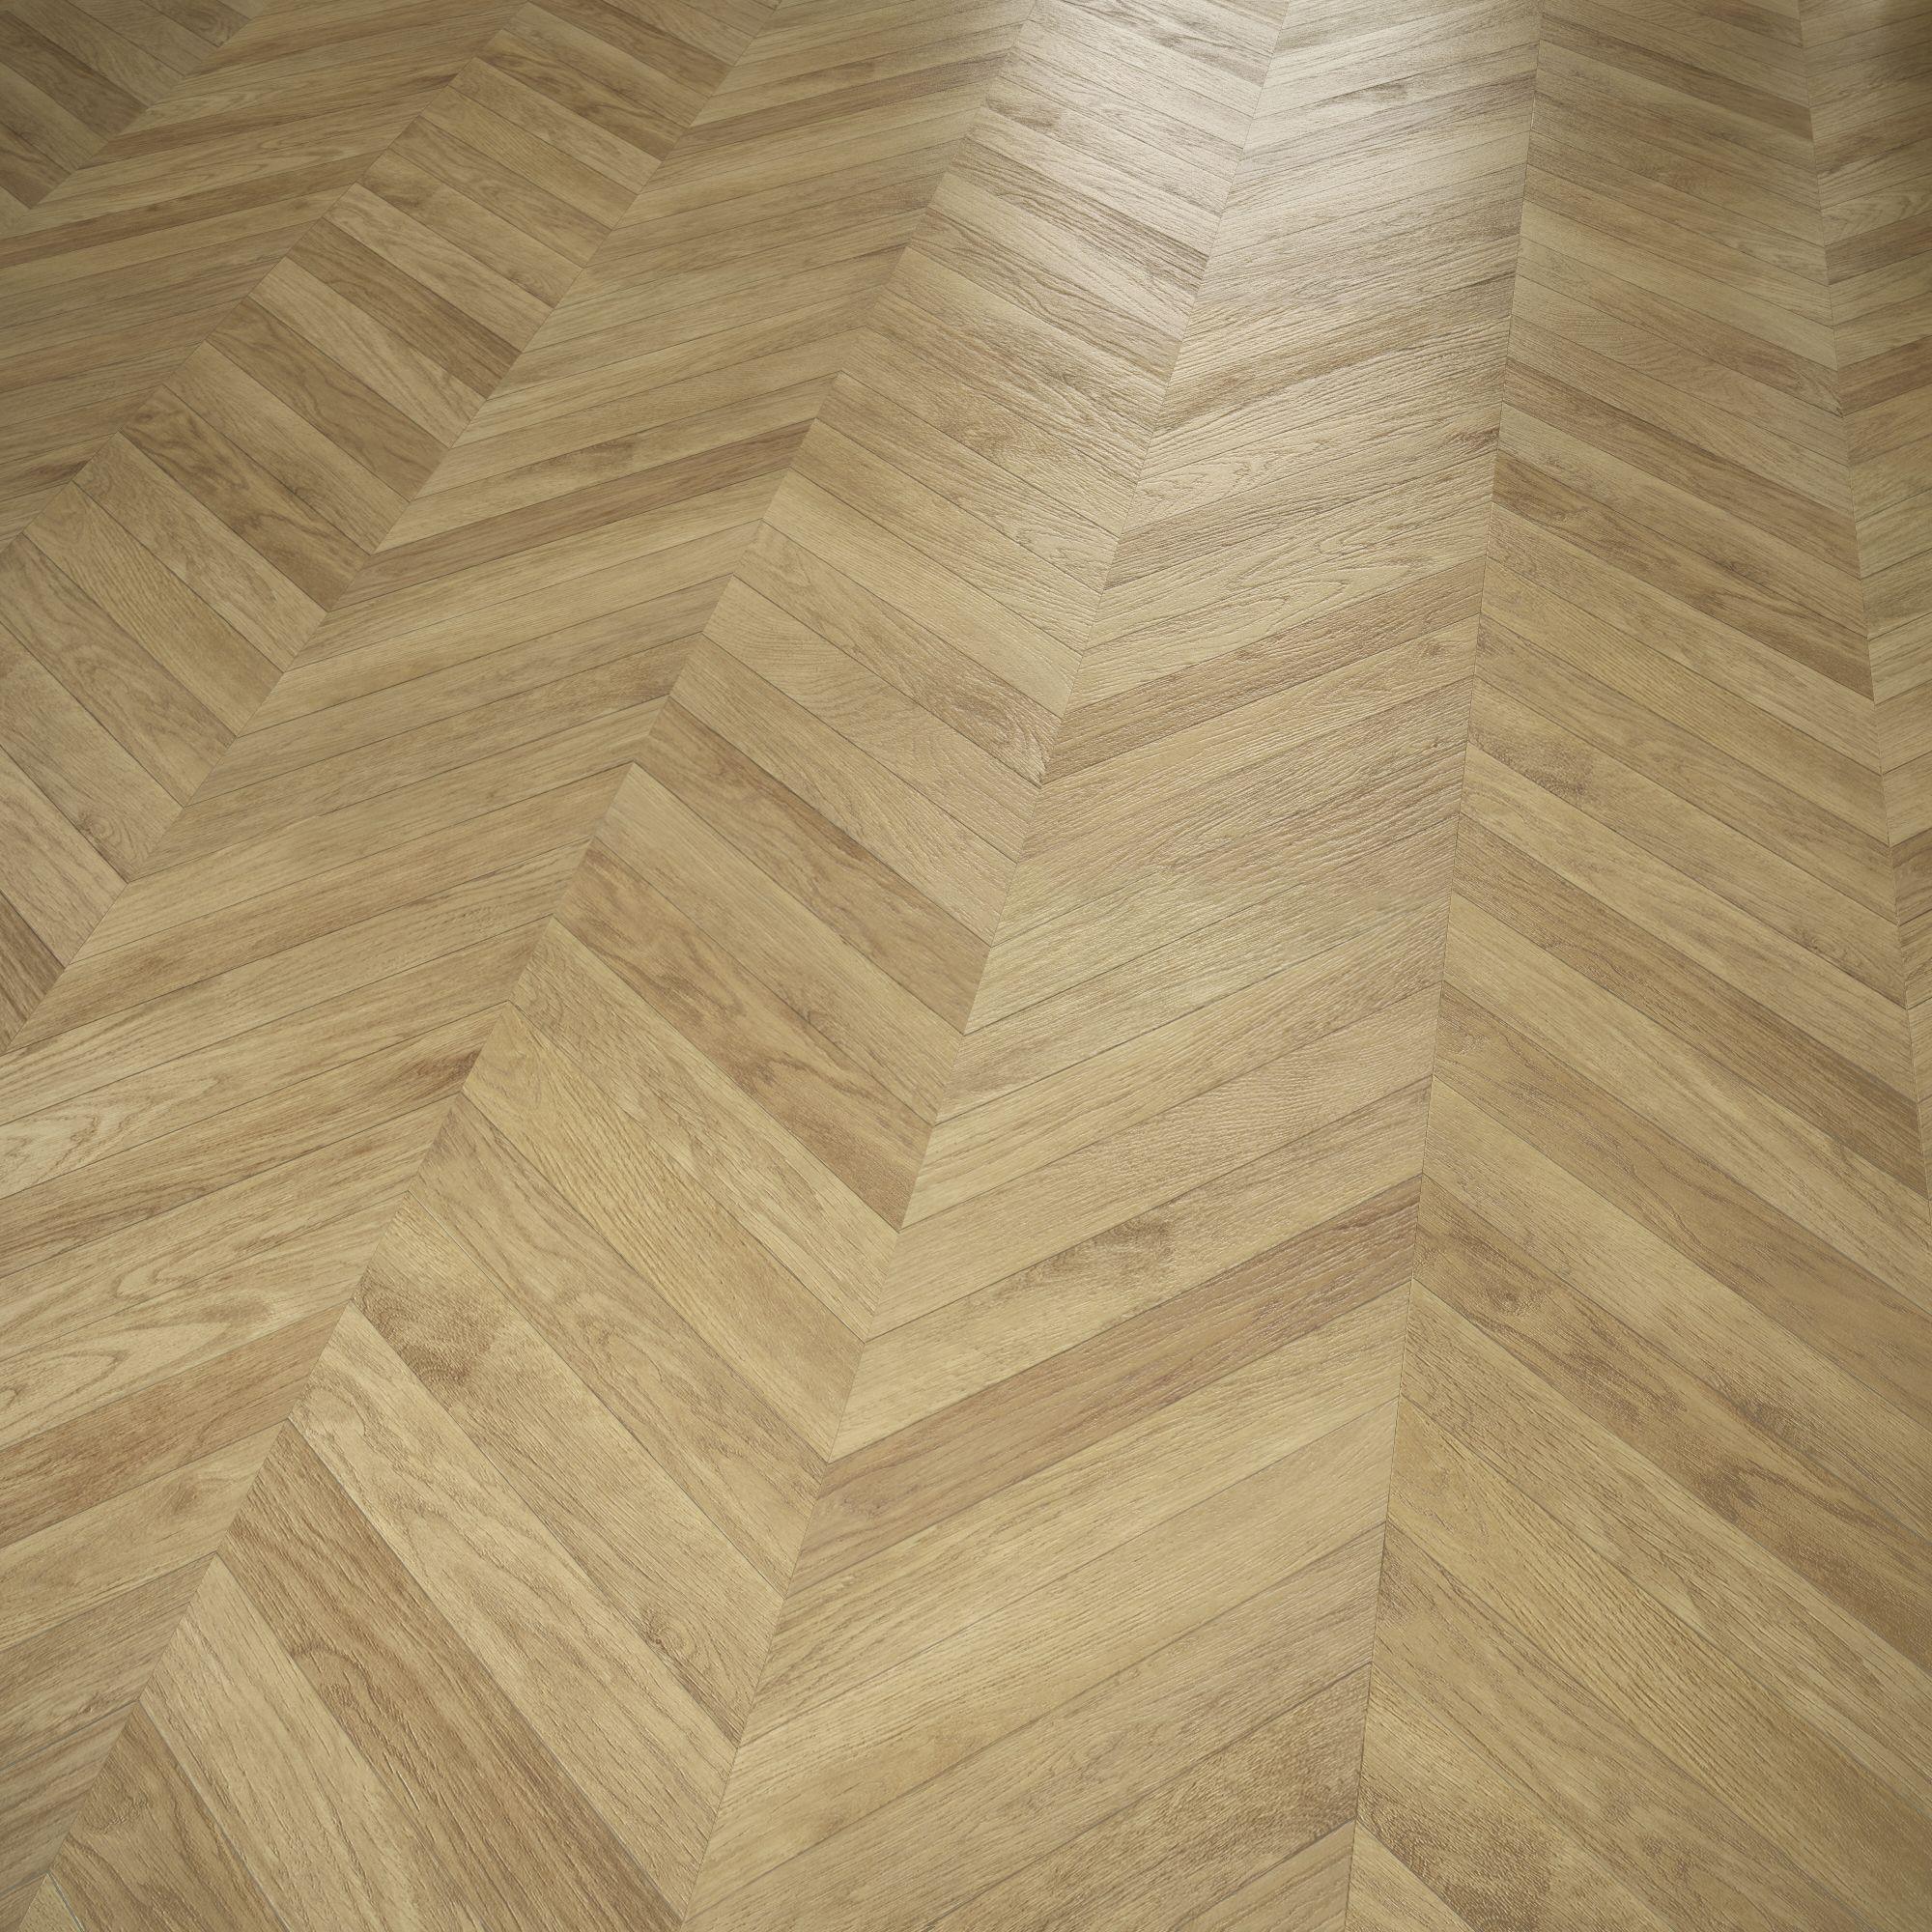 Diy at b q for Diy laminate flooring